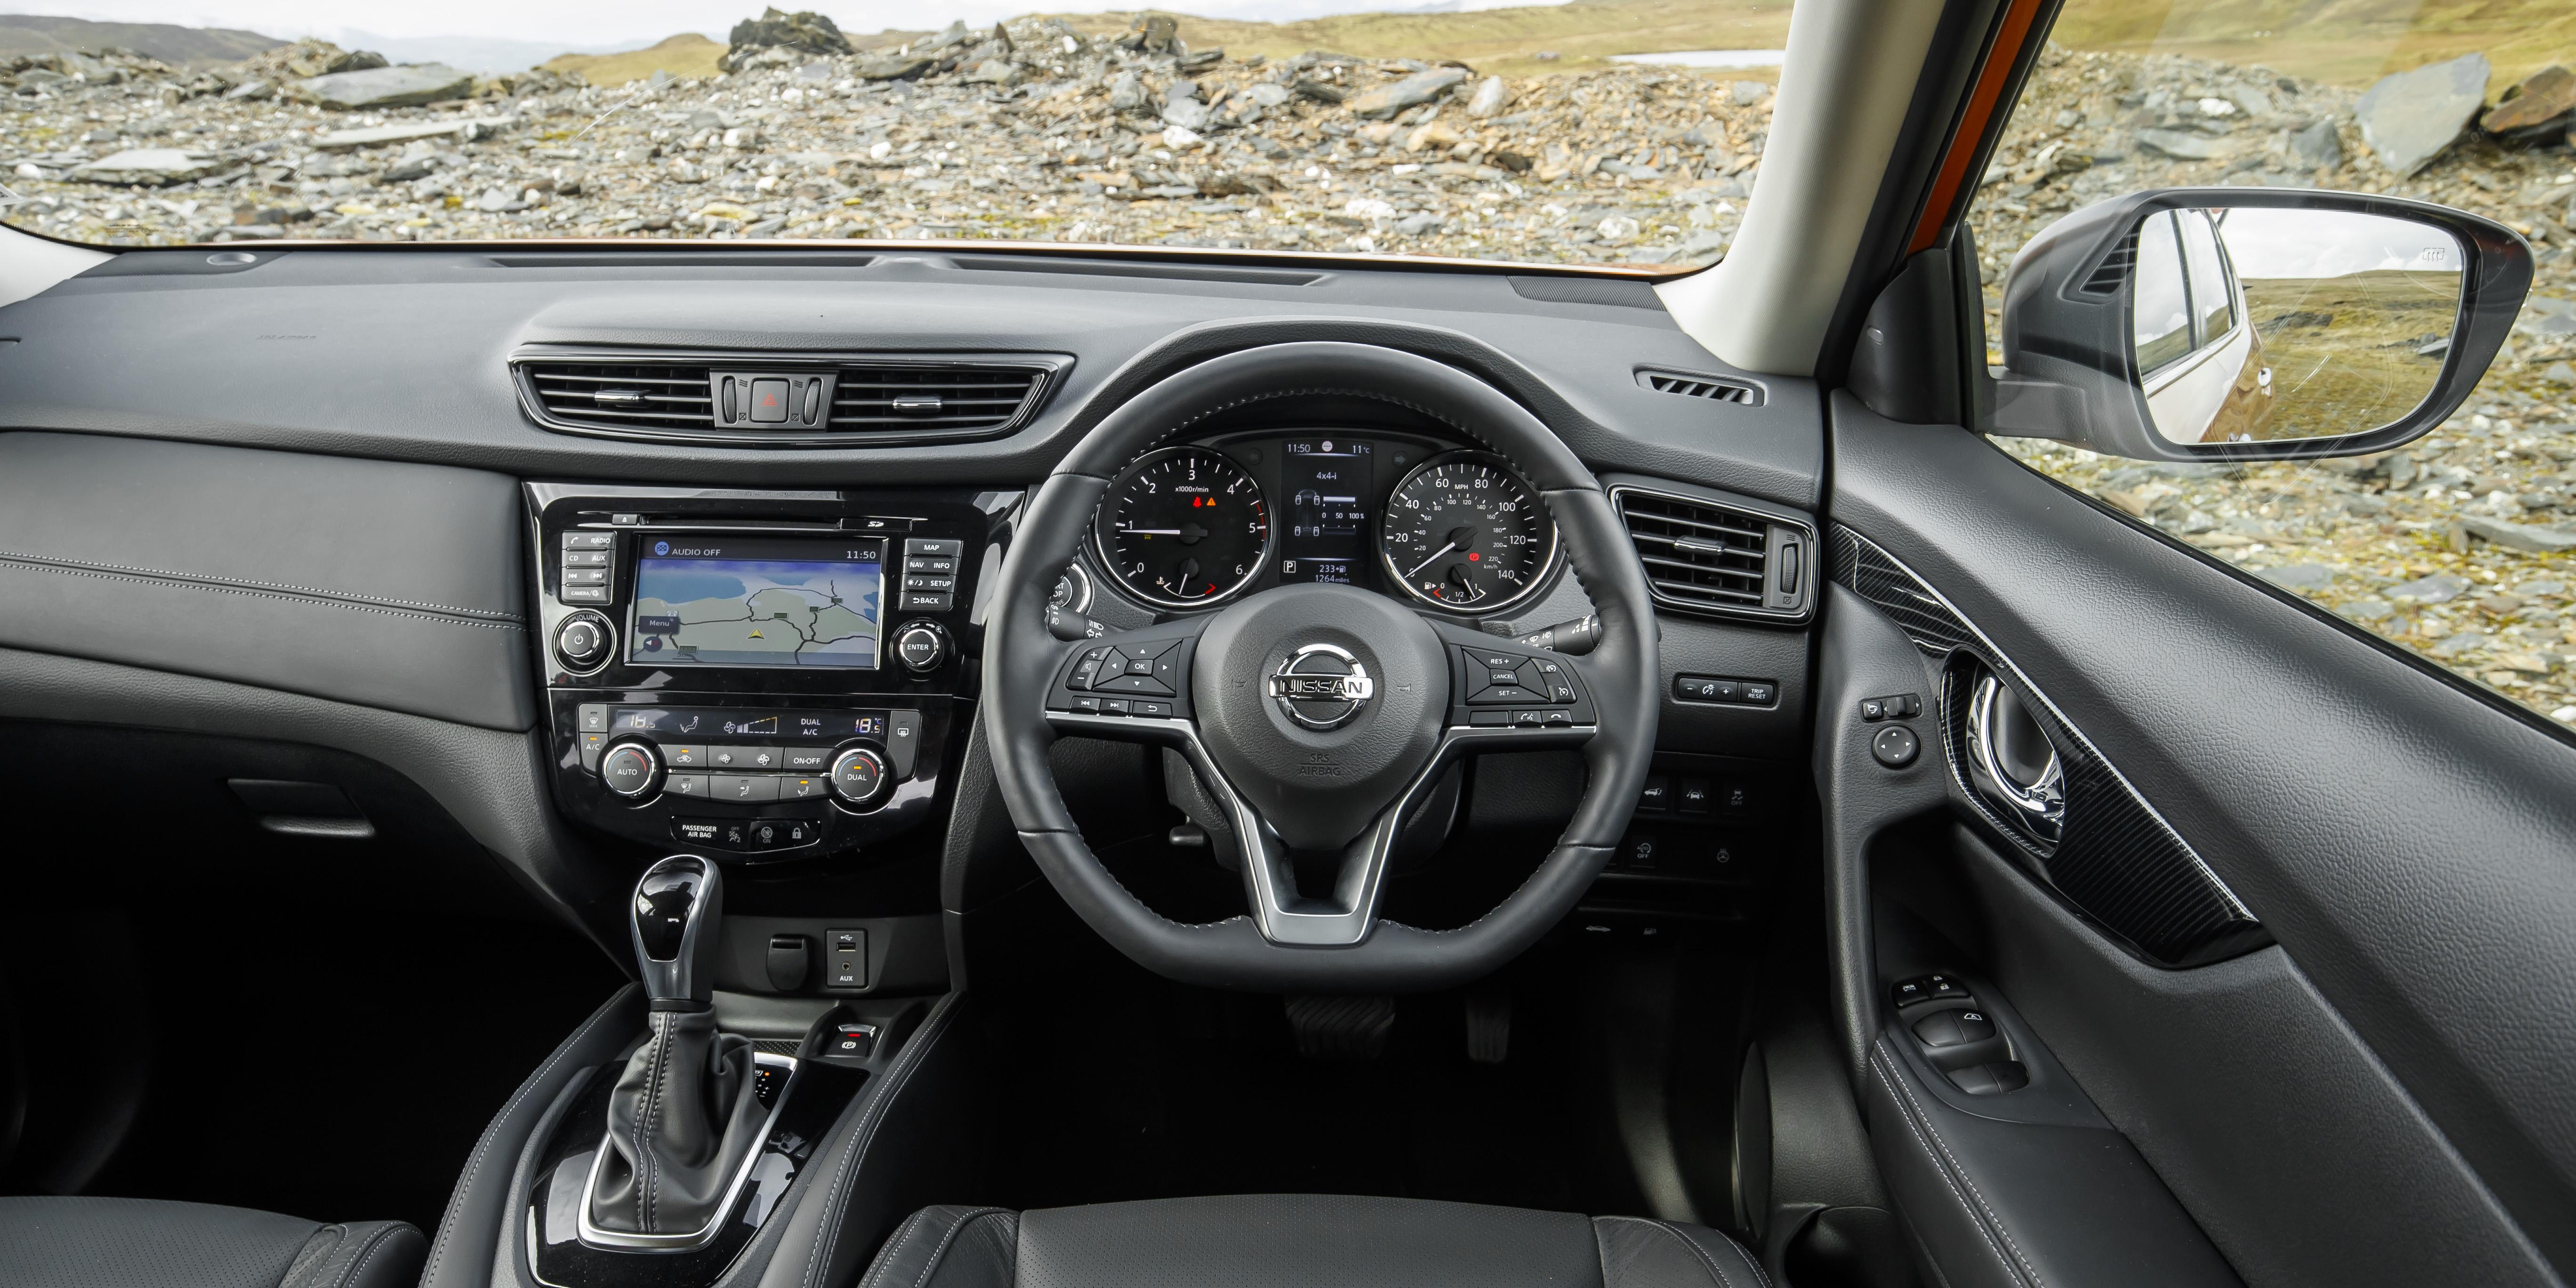 Nissan X-Trail Interior & Infotainment | carwow